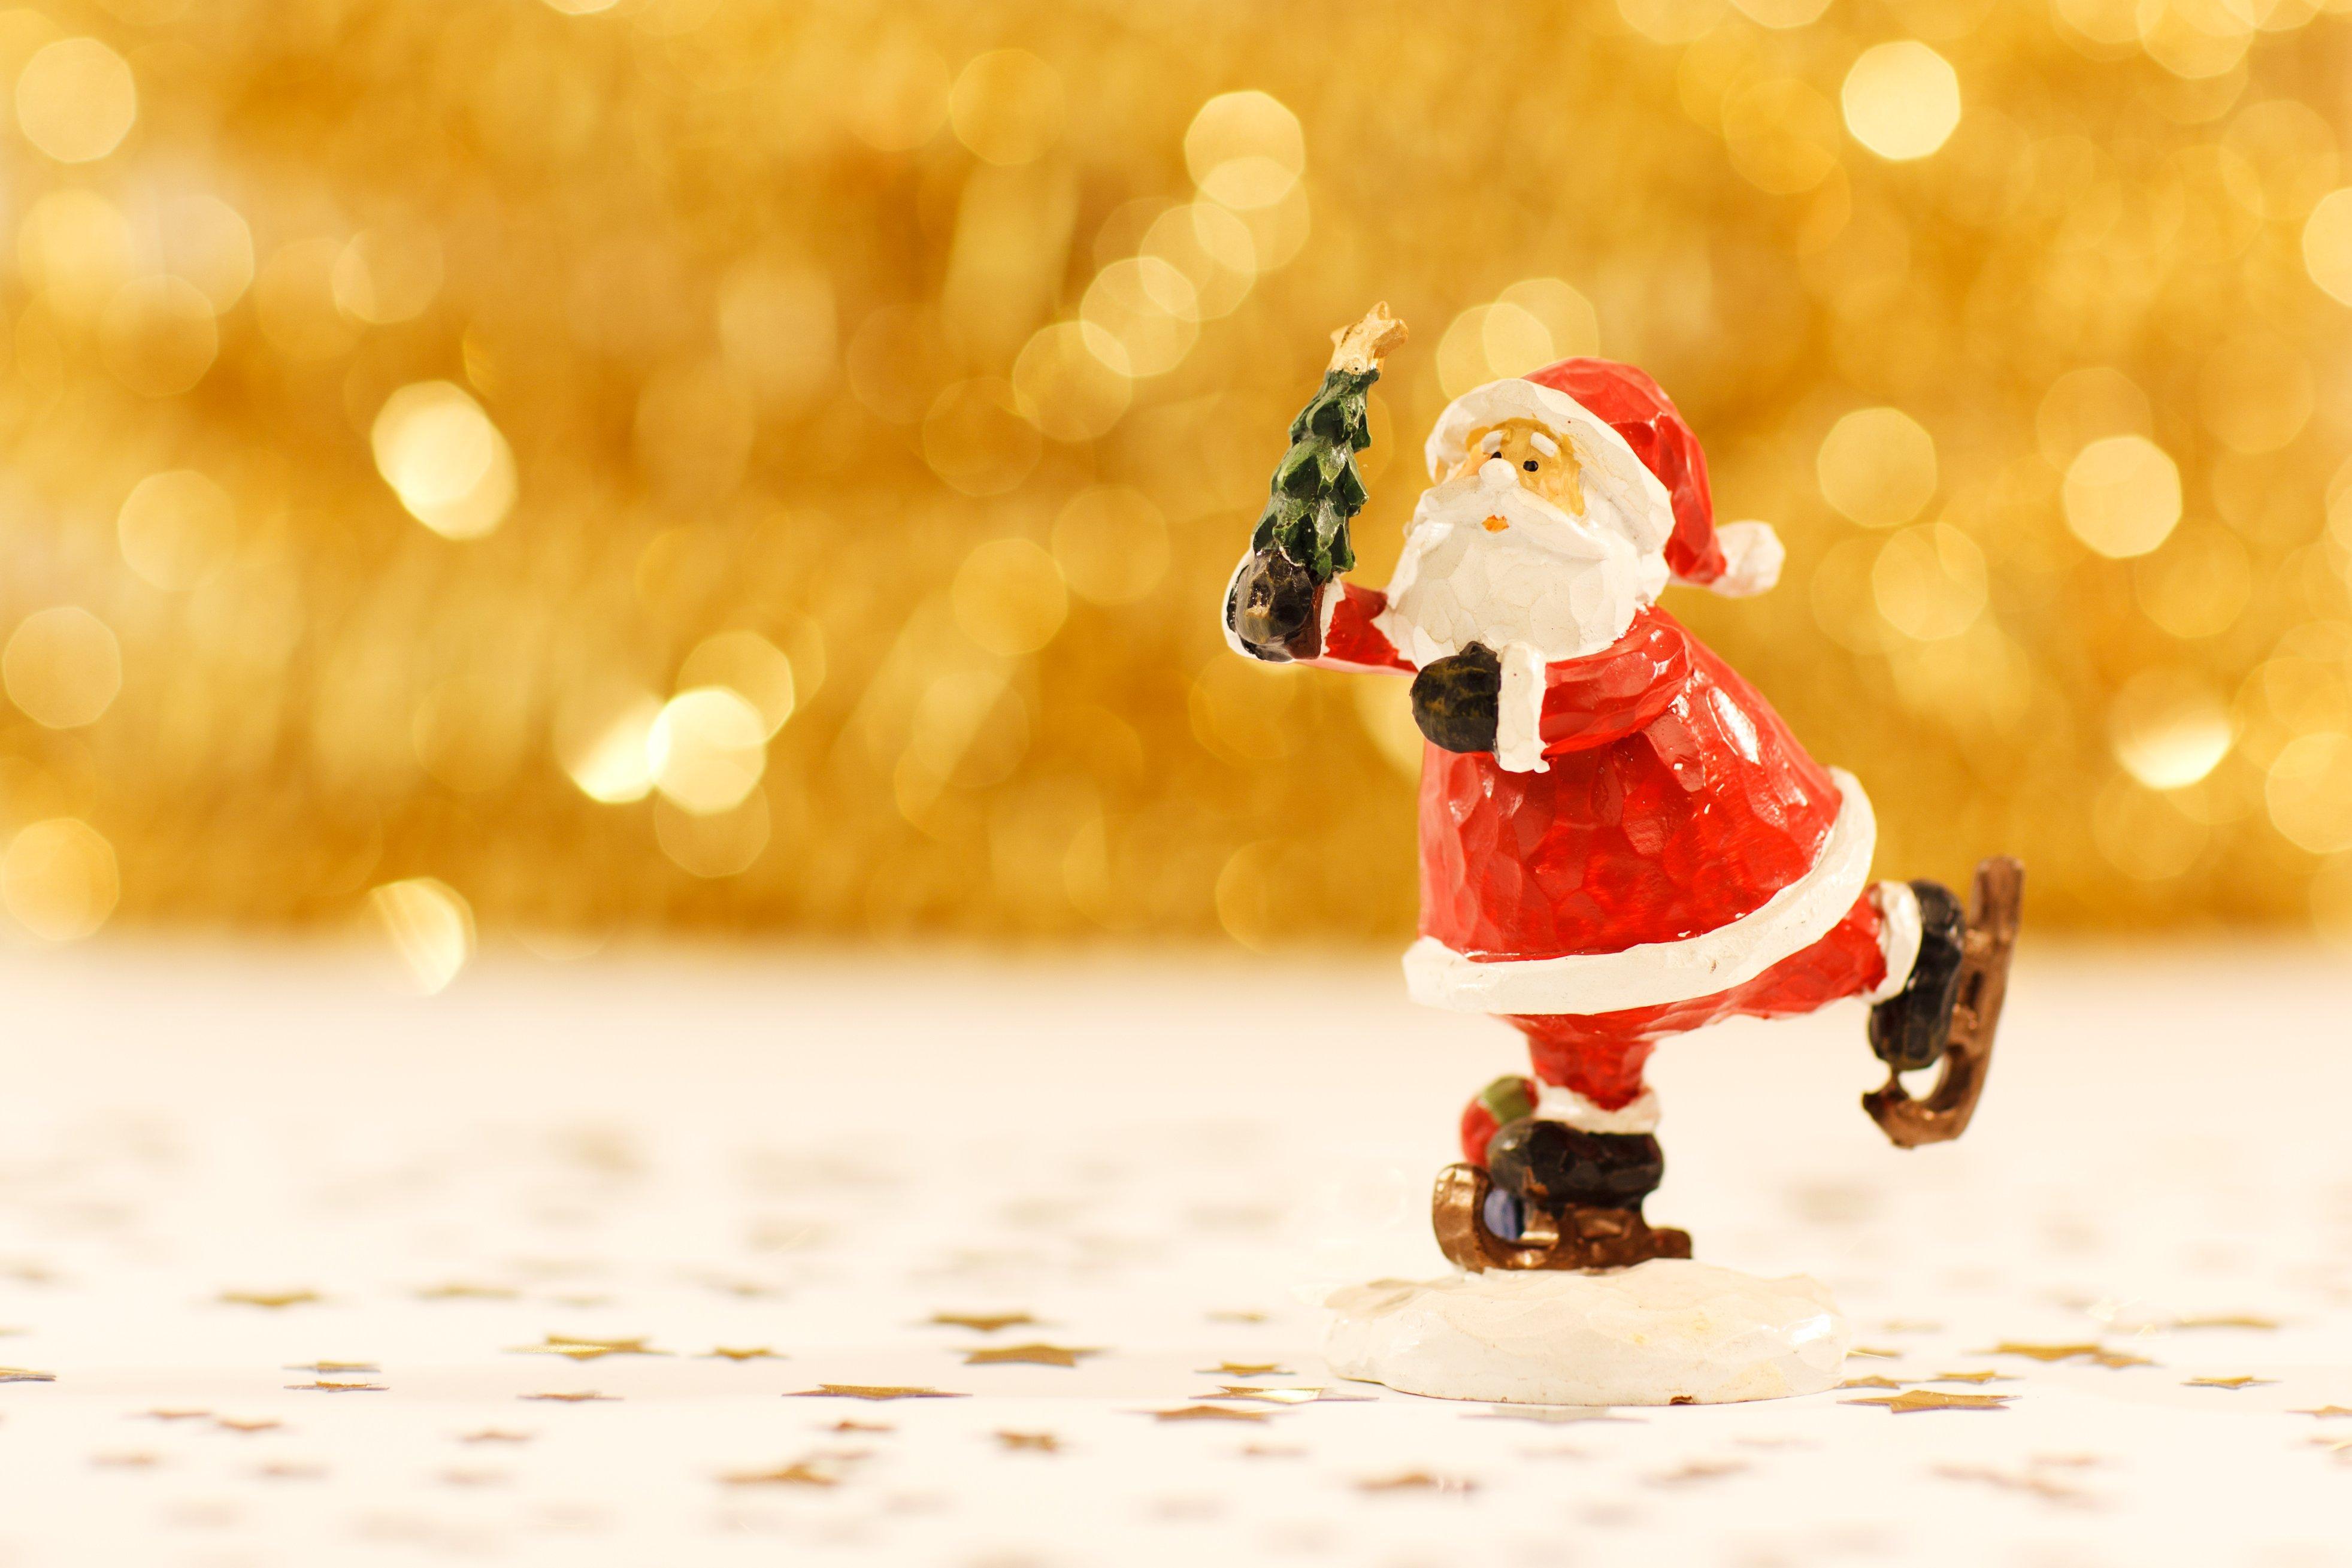 santa clause figurine free stock photo